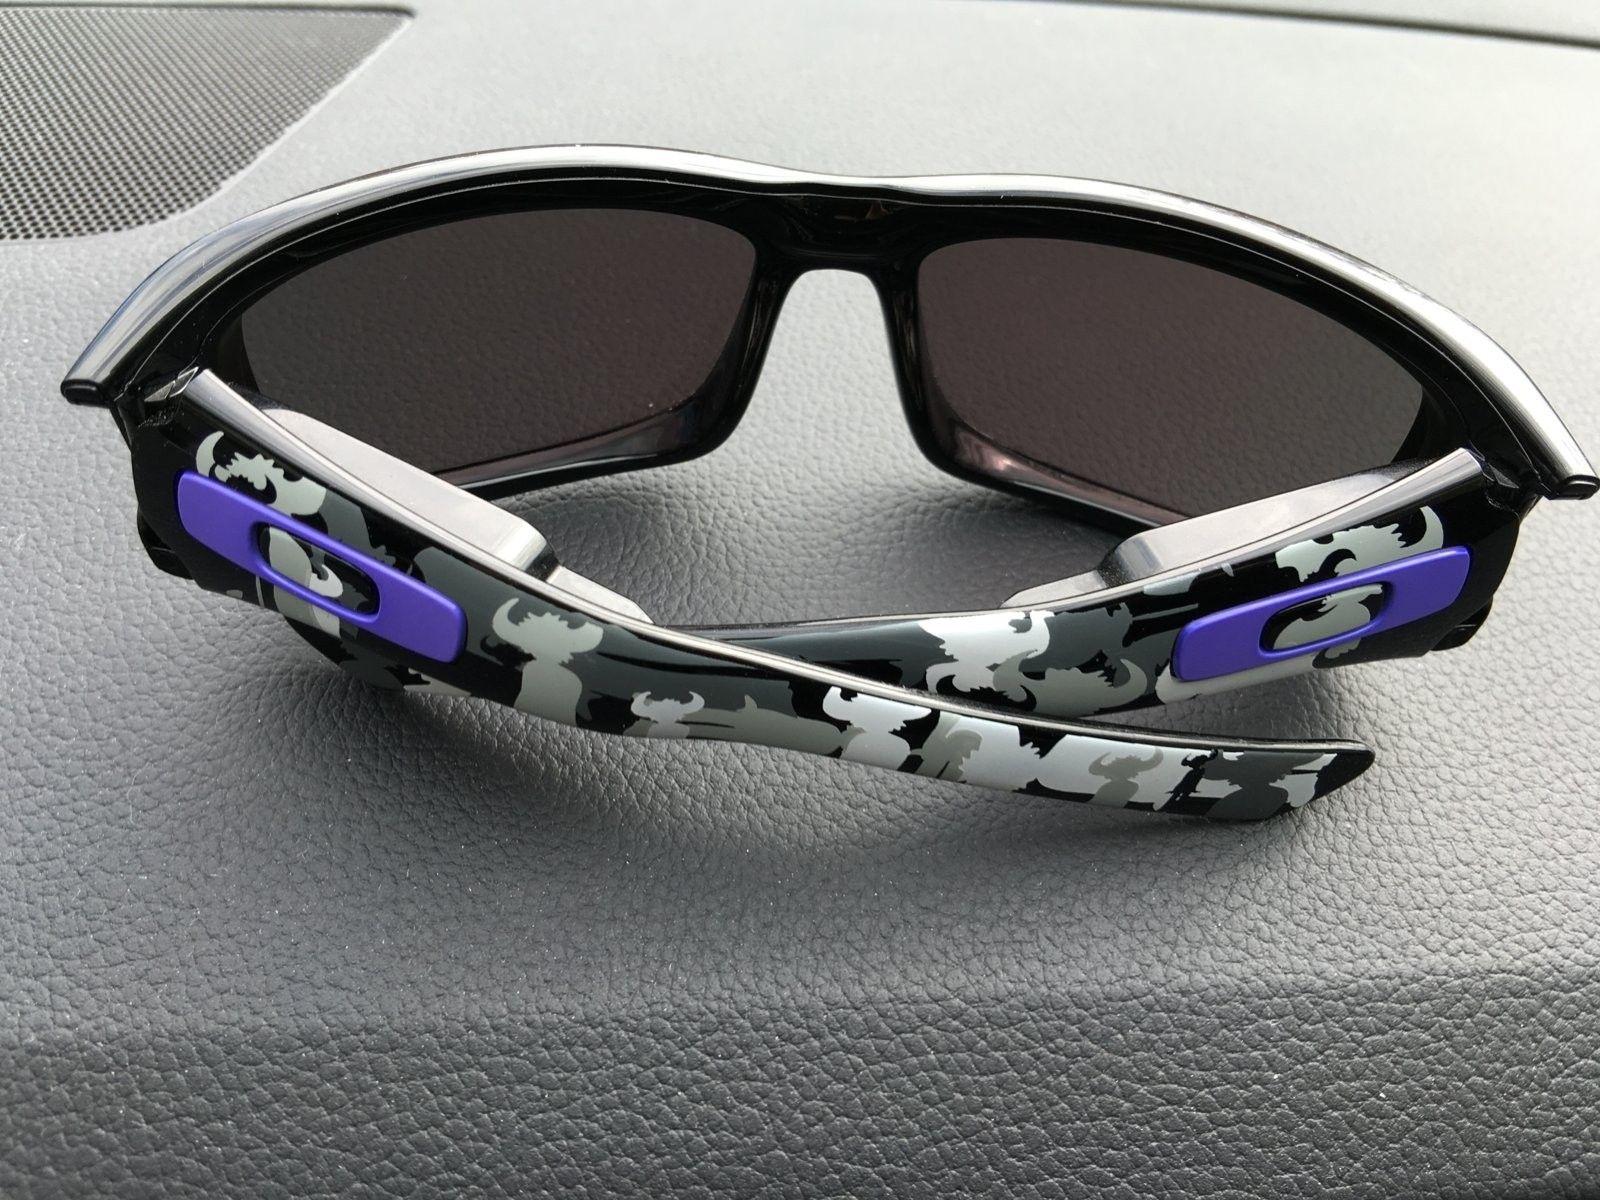 Oakley Split Thump Jamiroquai Limited Edition - image.jpeg